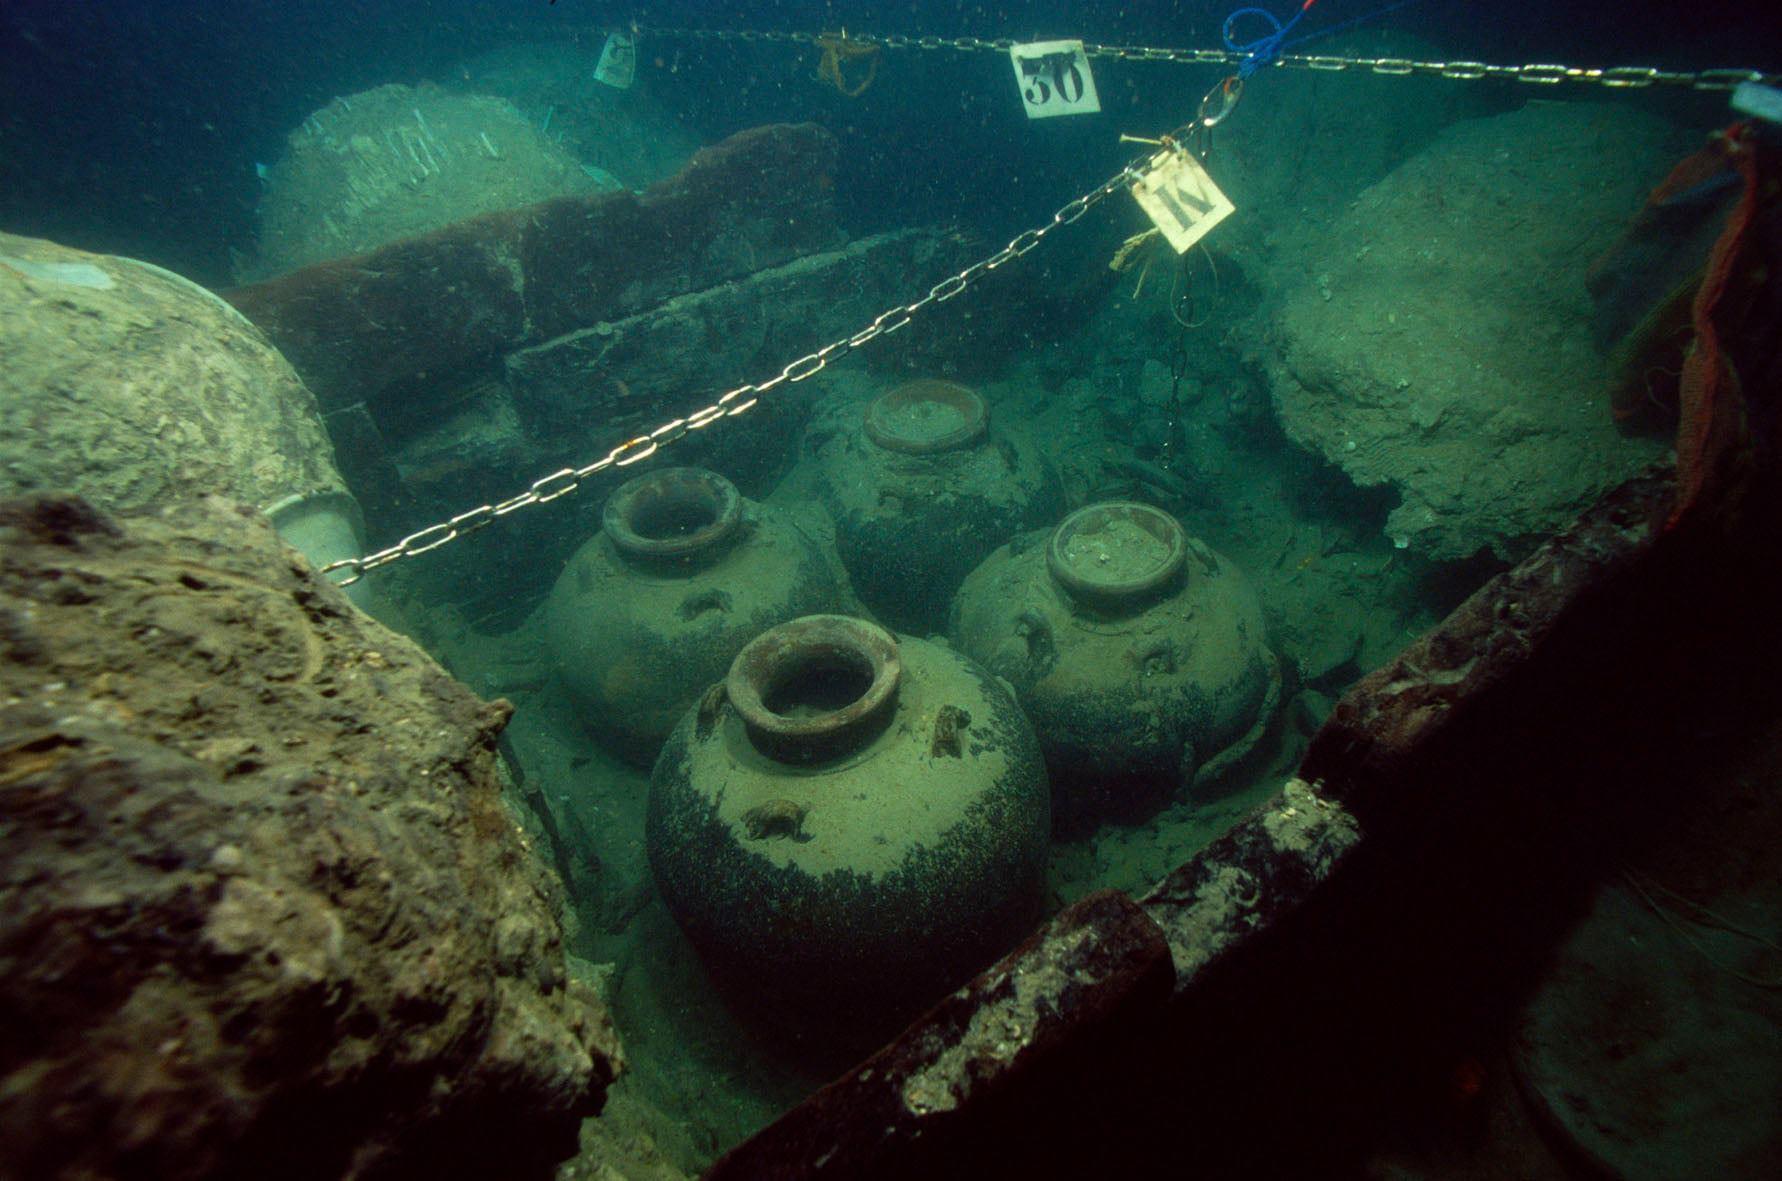 Storage jars from the Santa Cruz shipwreck